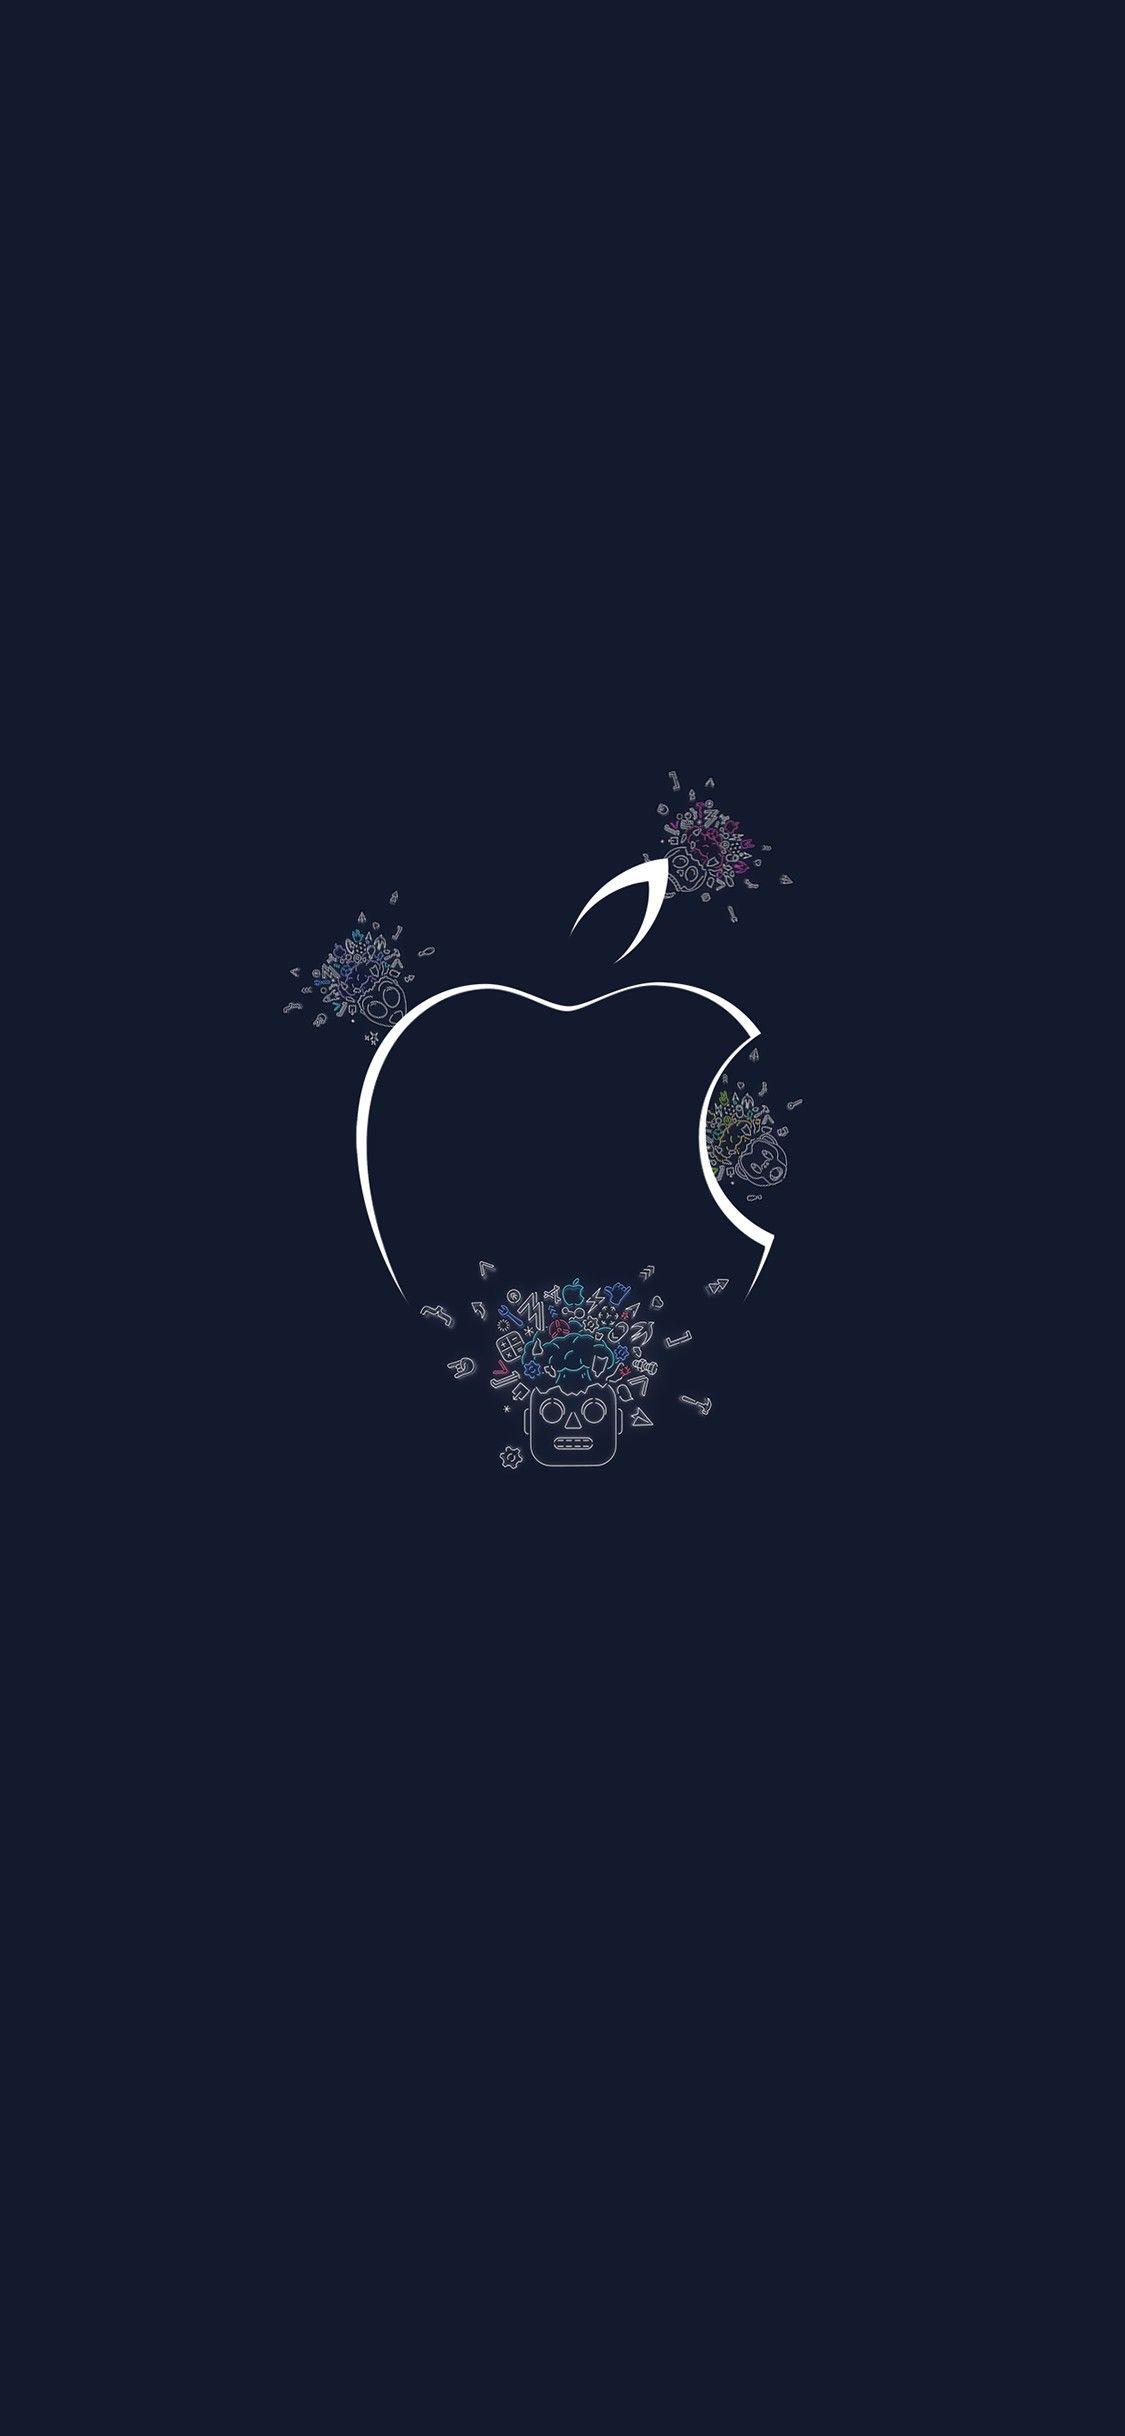 Elegant Apple Logo Wallpaper 4k For Iphone Wallpaper Ponsel Gambar Latar Belakang